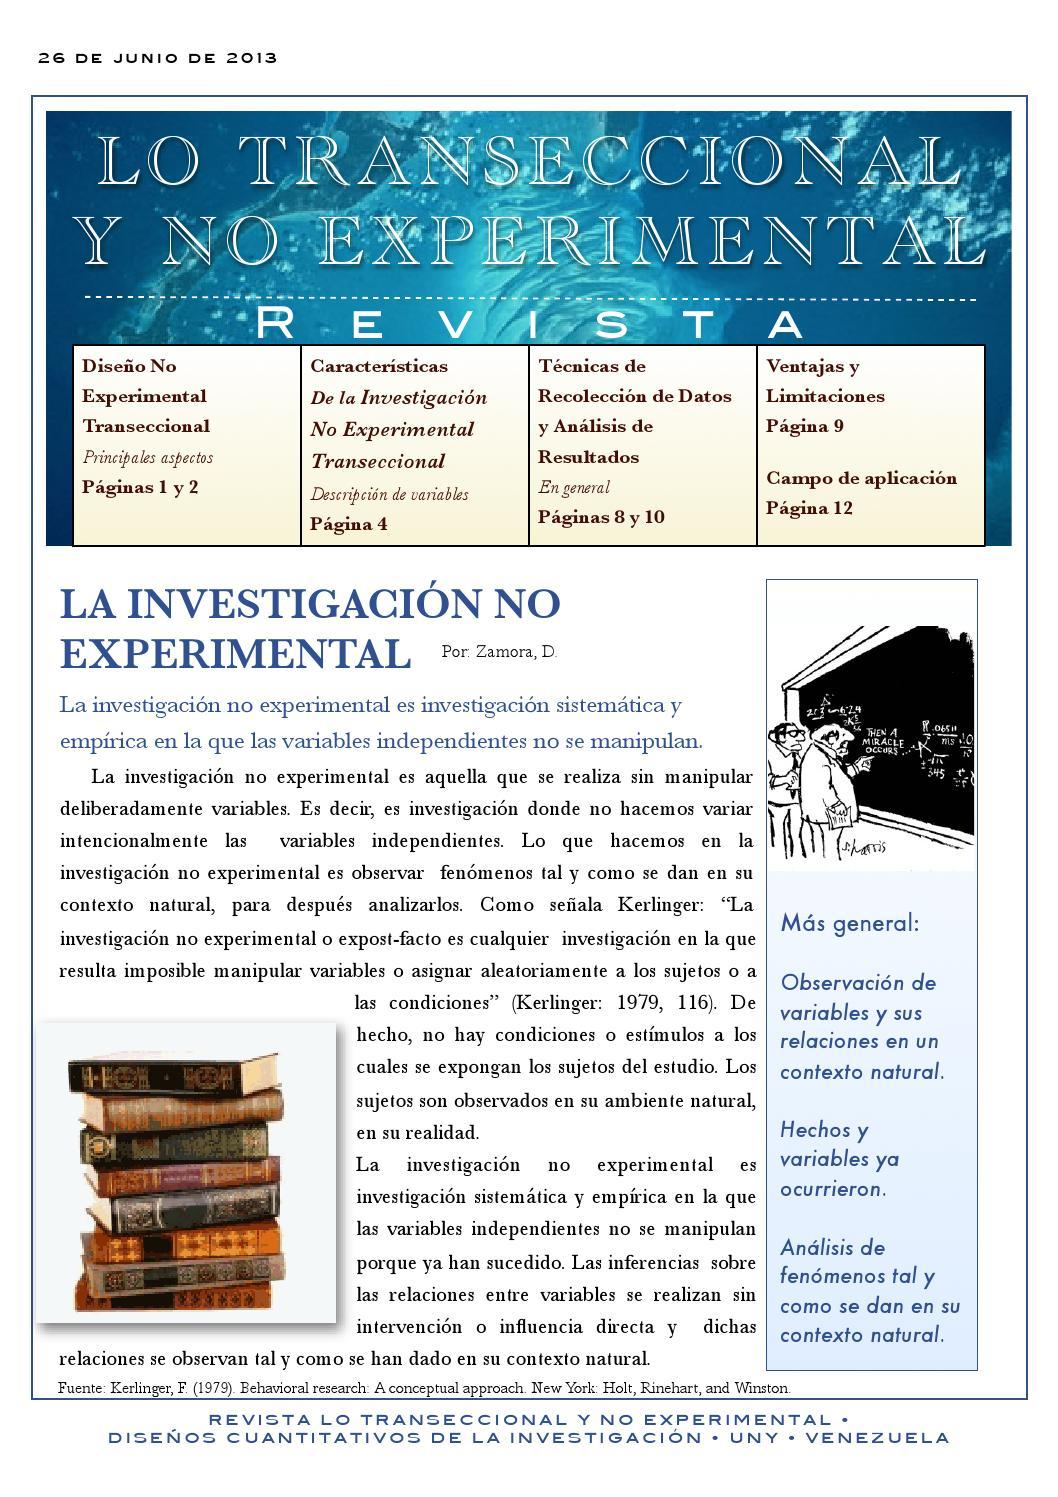 �9ᢹi&�l$zd�y.9b_RevistadigitaldiseñonoexperimentaltranseccionalmymmzdbyMarianaMartinez-Issuu